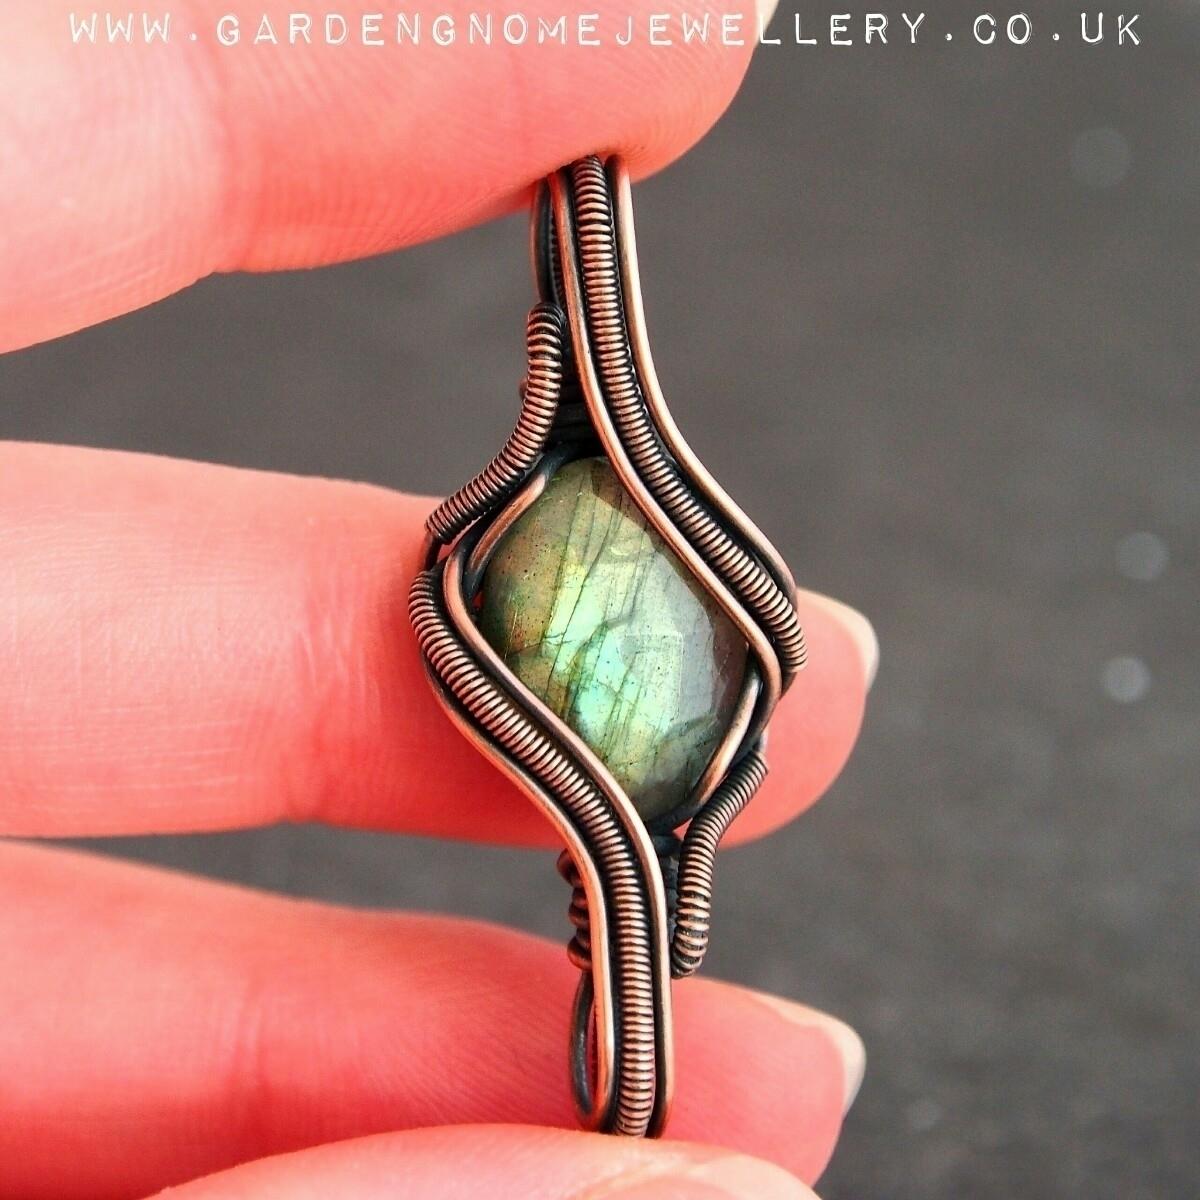 Find lovely labradorite piece s - gardengnomejewellery | ello